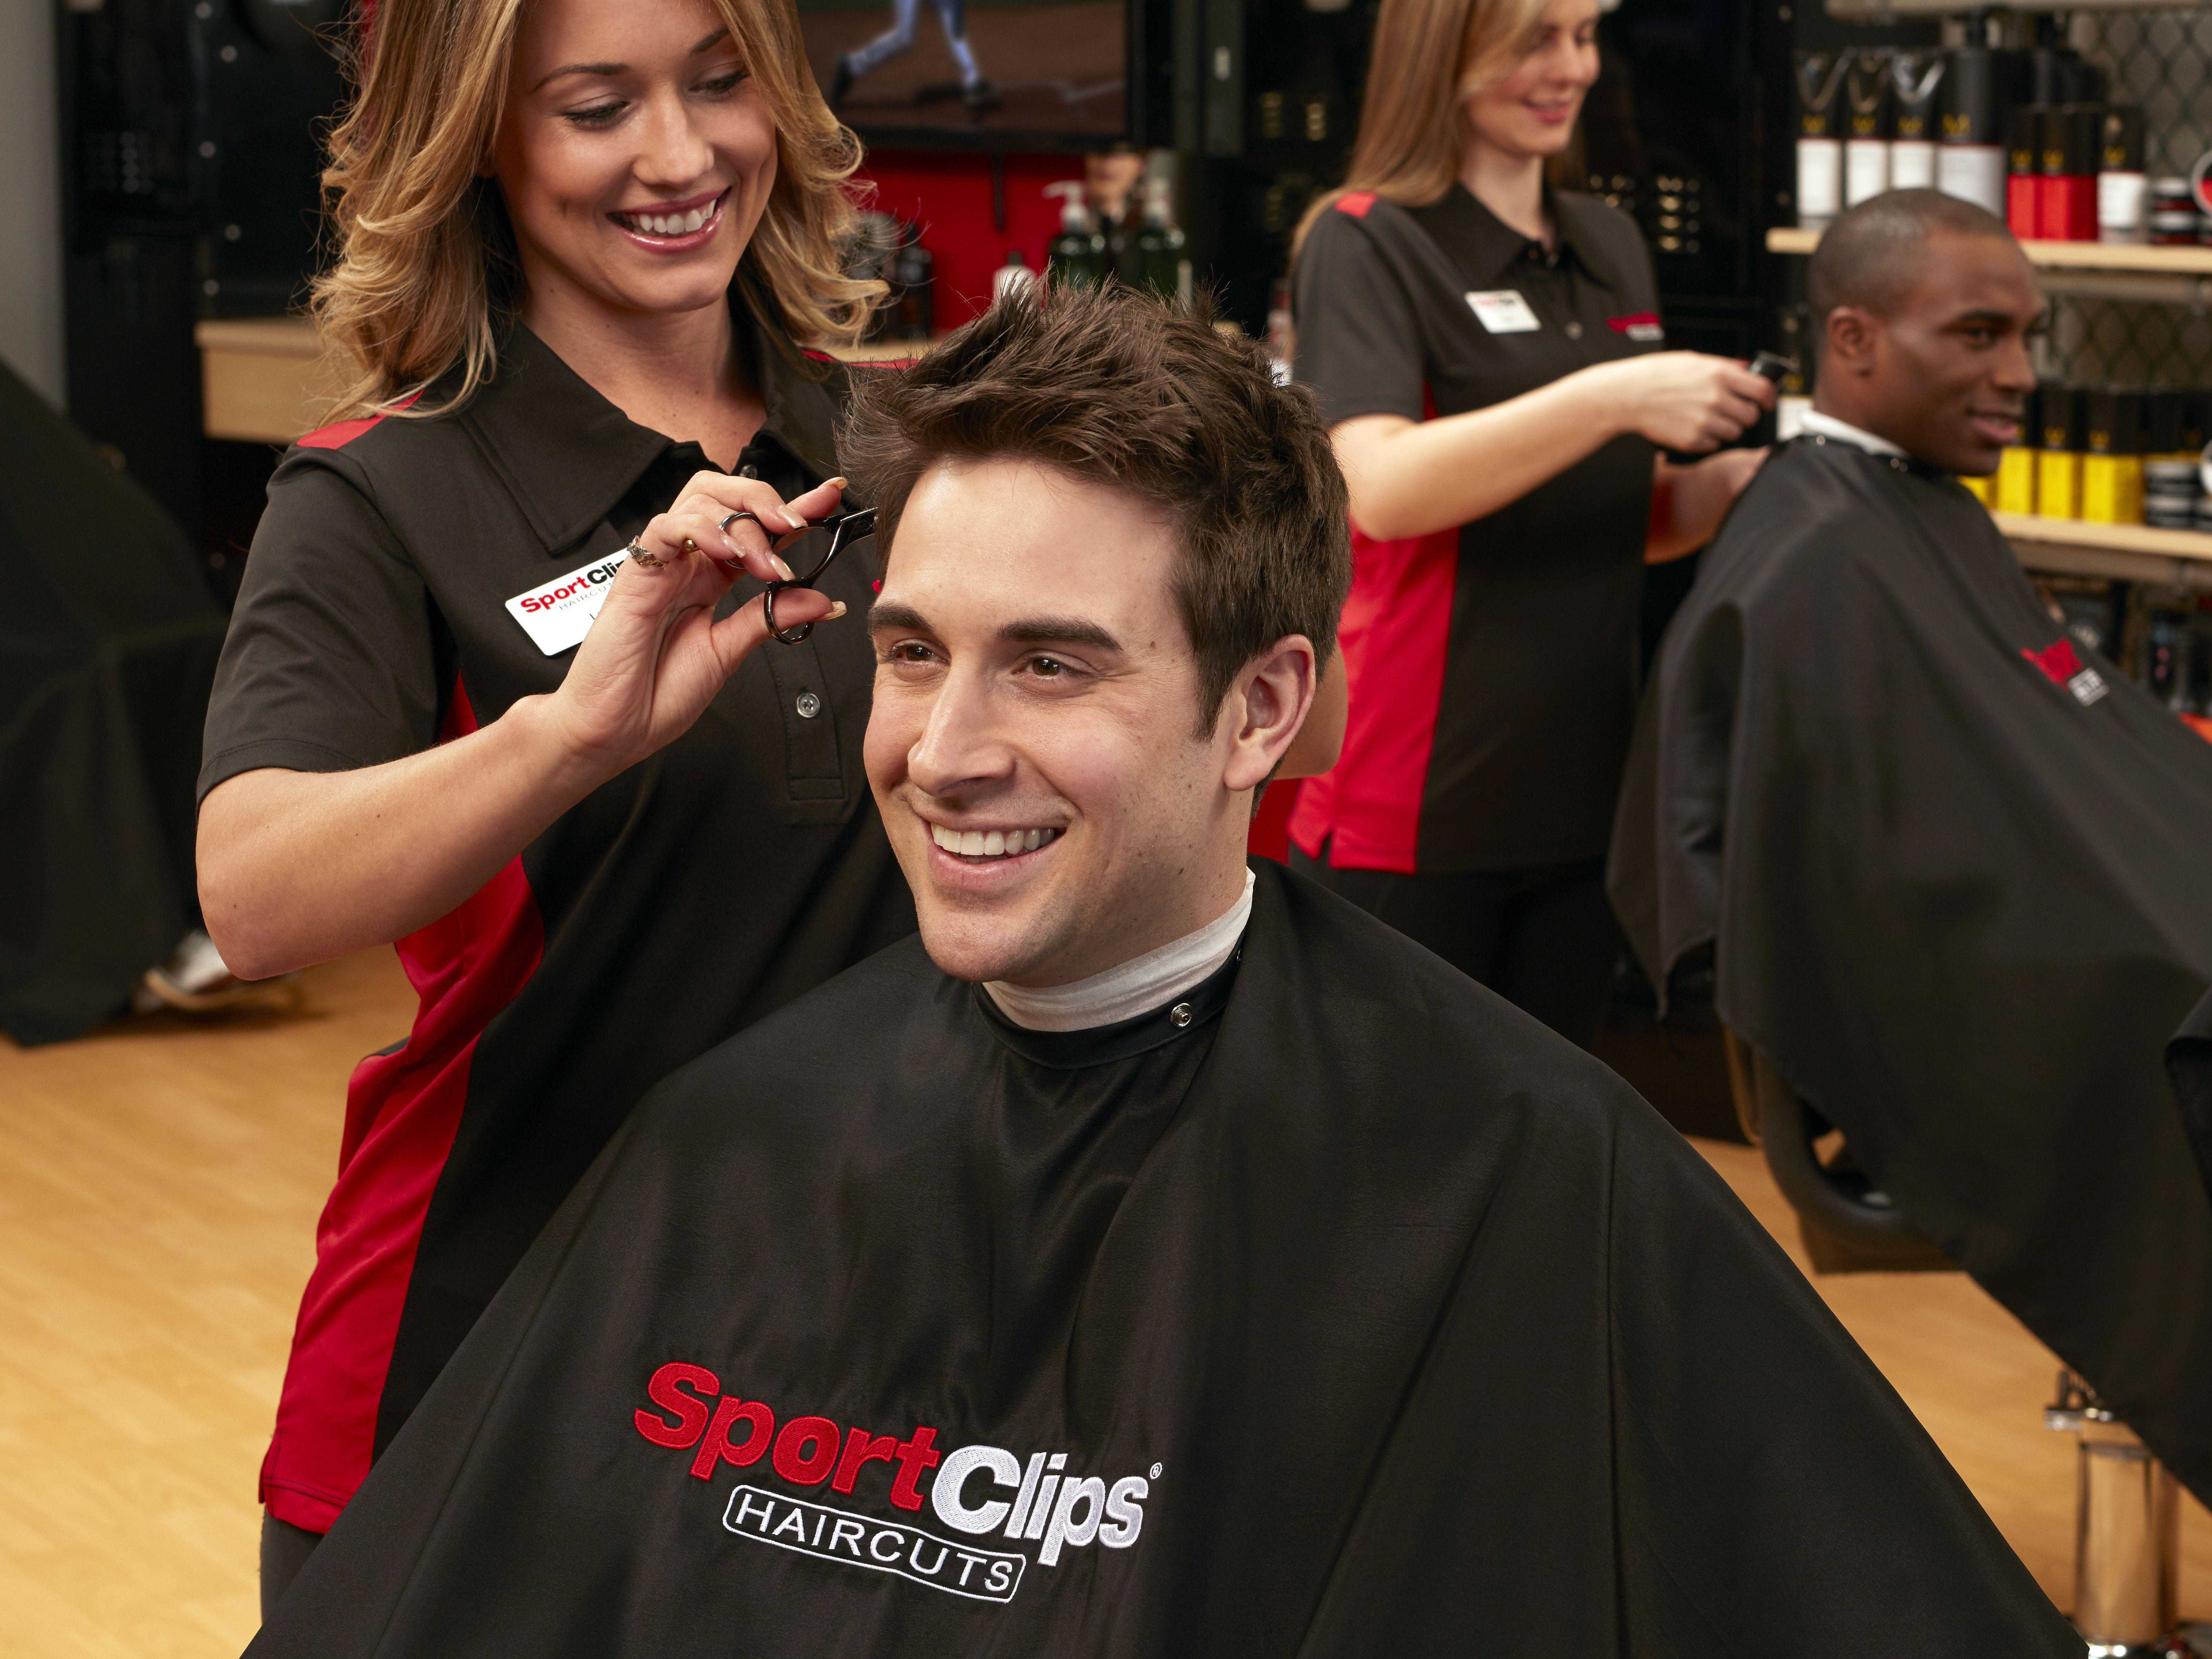 Sport clips haircuts ctgqyp